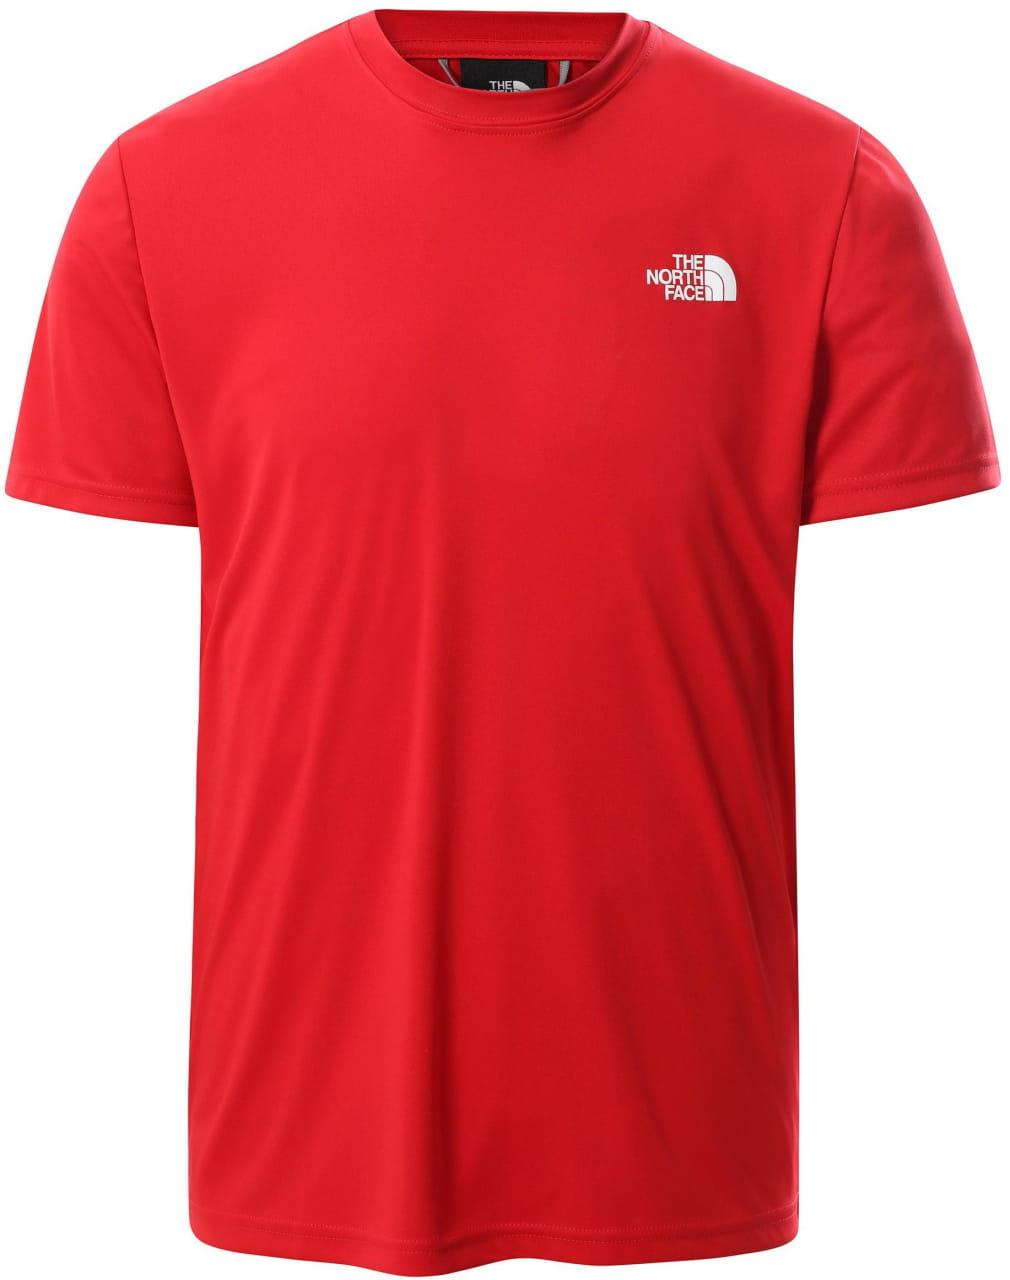 Pánské tričko The North Face Men's Reaxion Red Box Tee